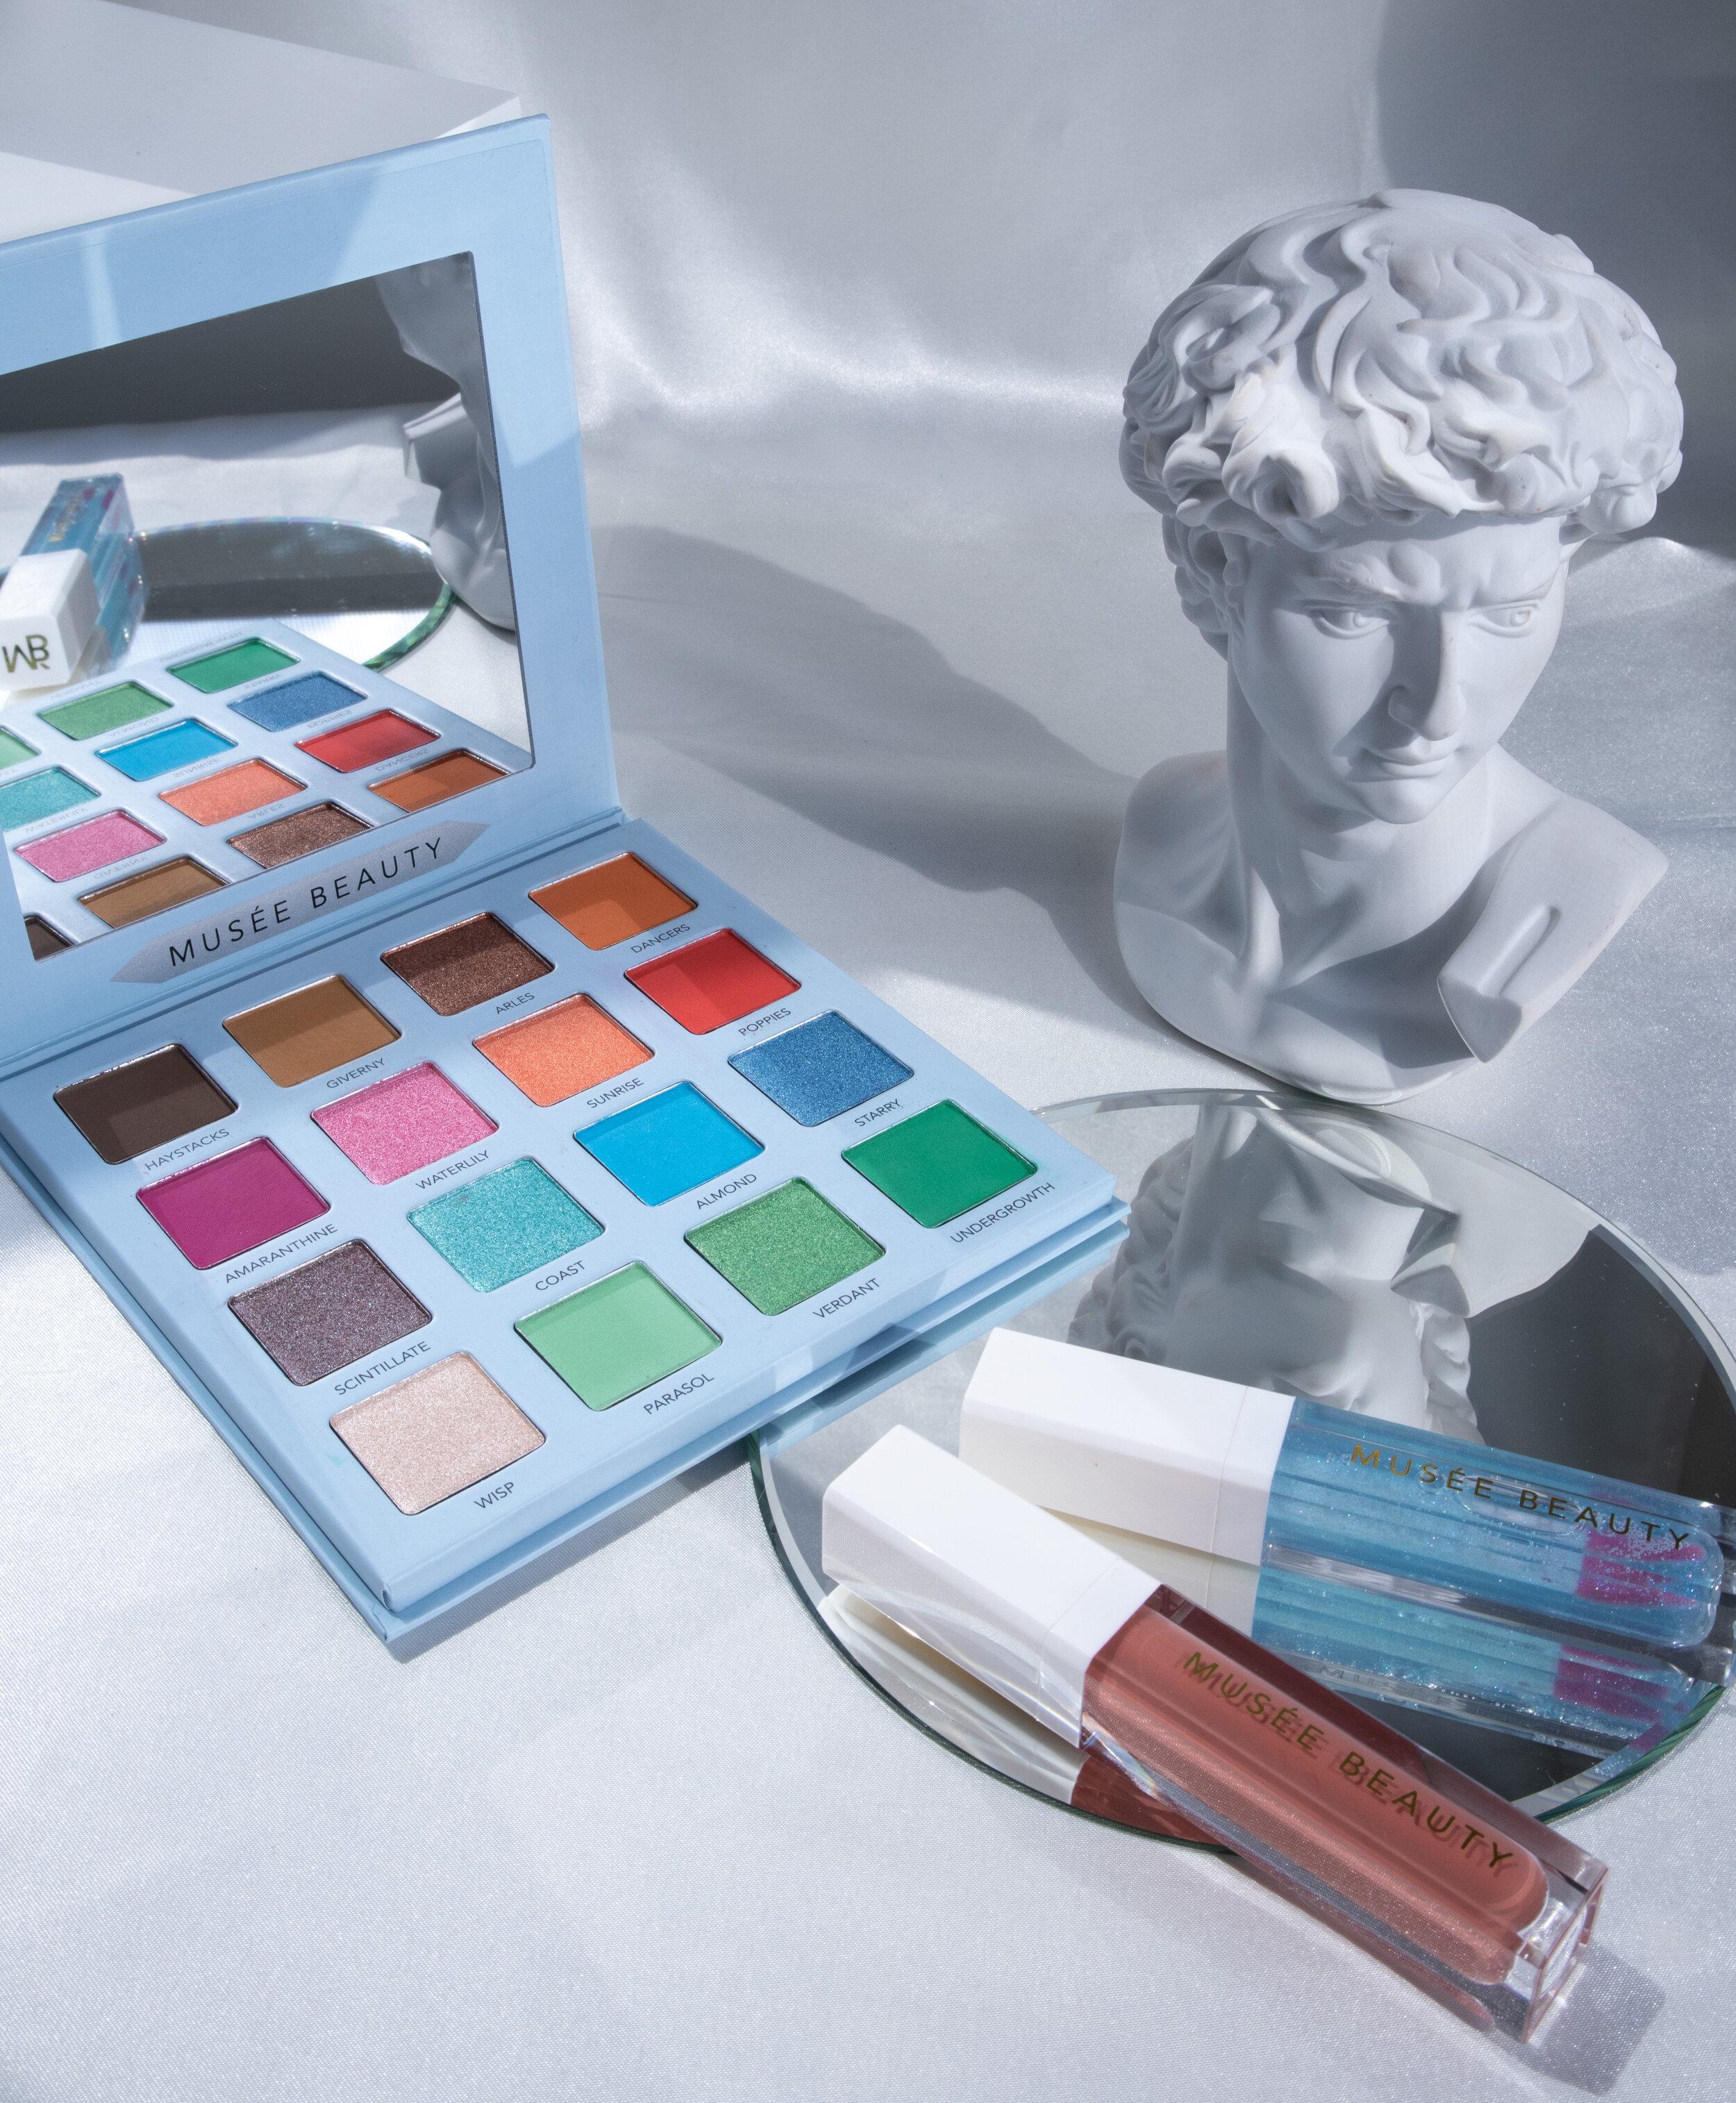 Musee-Beauty-Palette.jpg